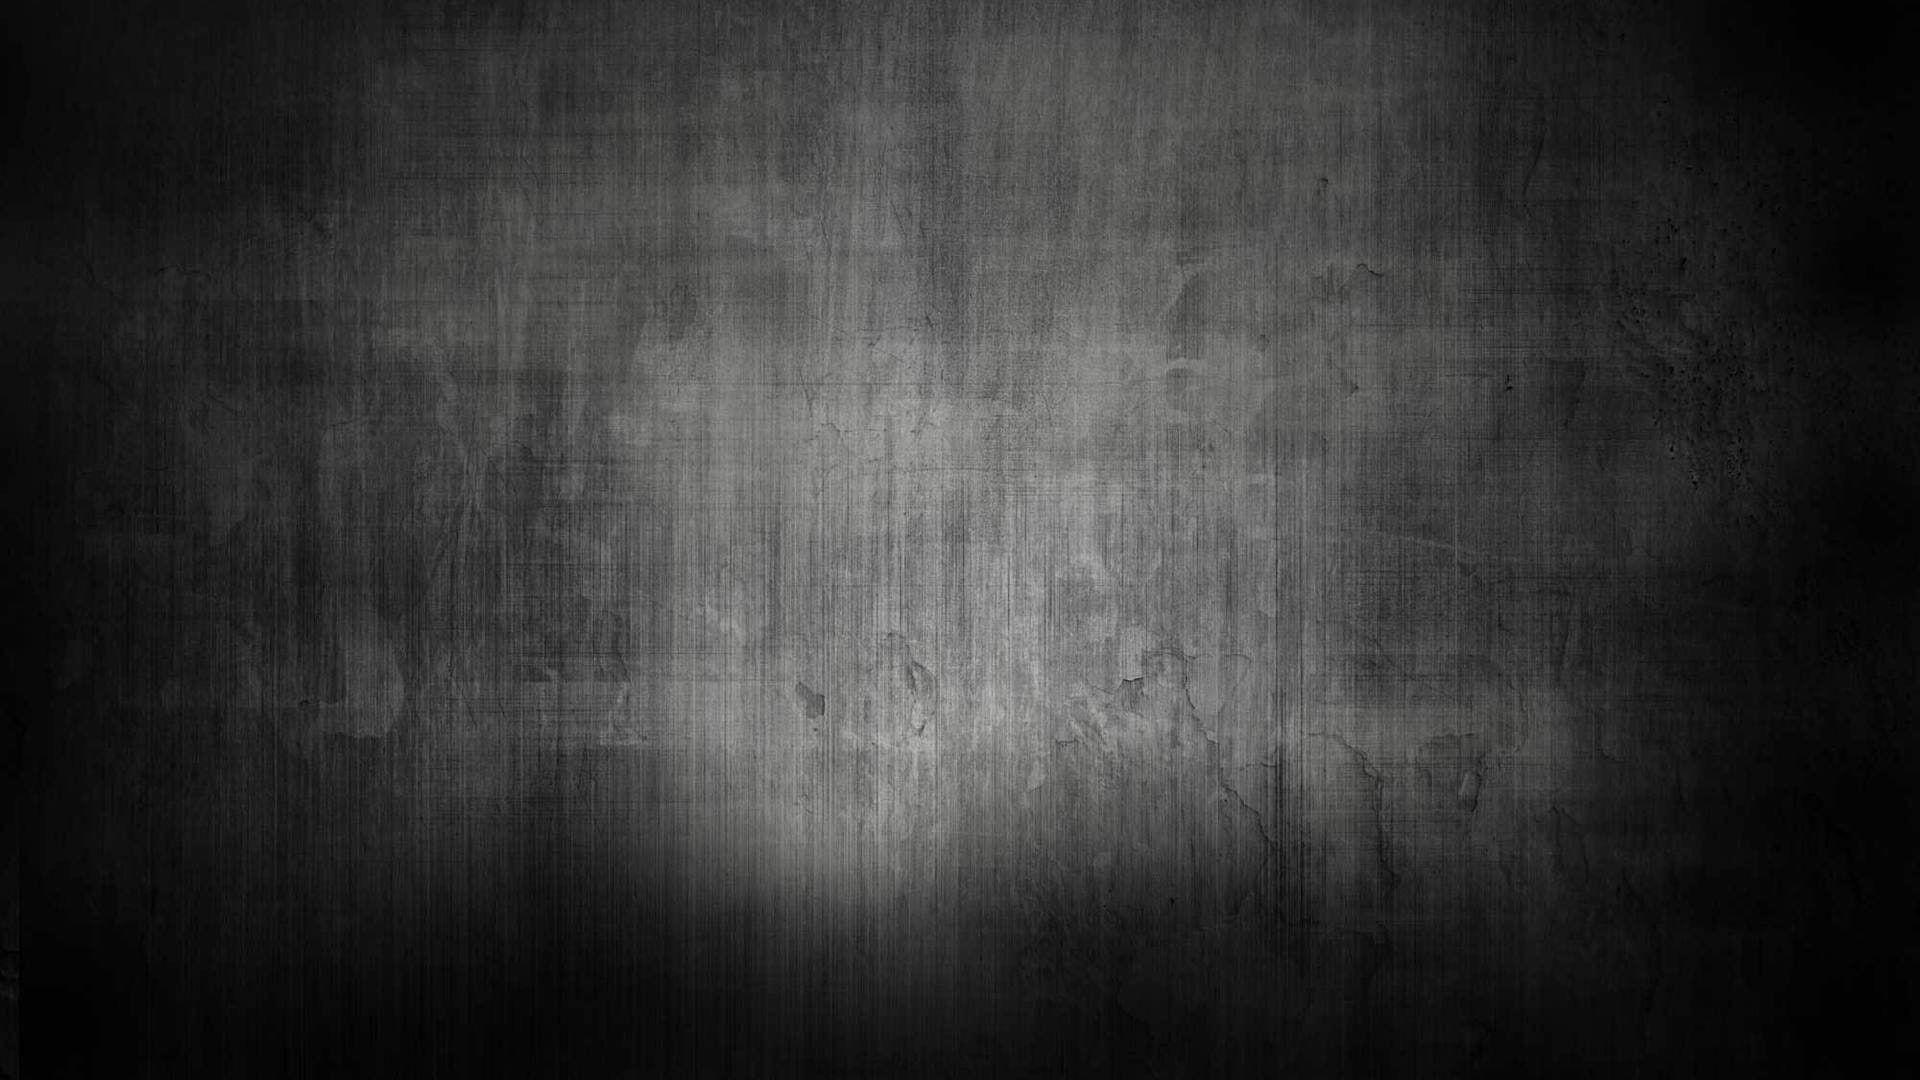 Dark Hd Wallpapers 1080p Black Background Wallpaper Black